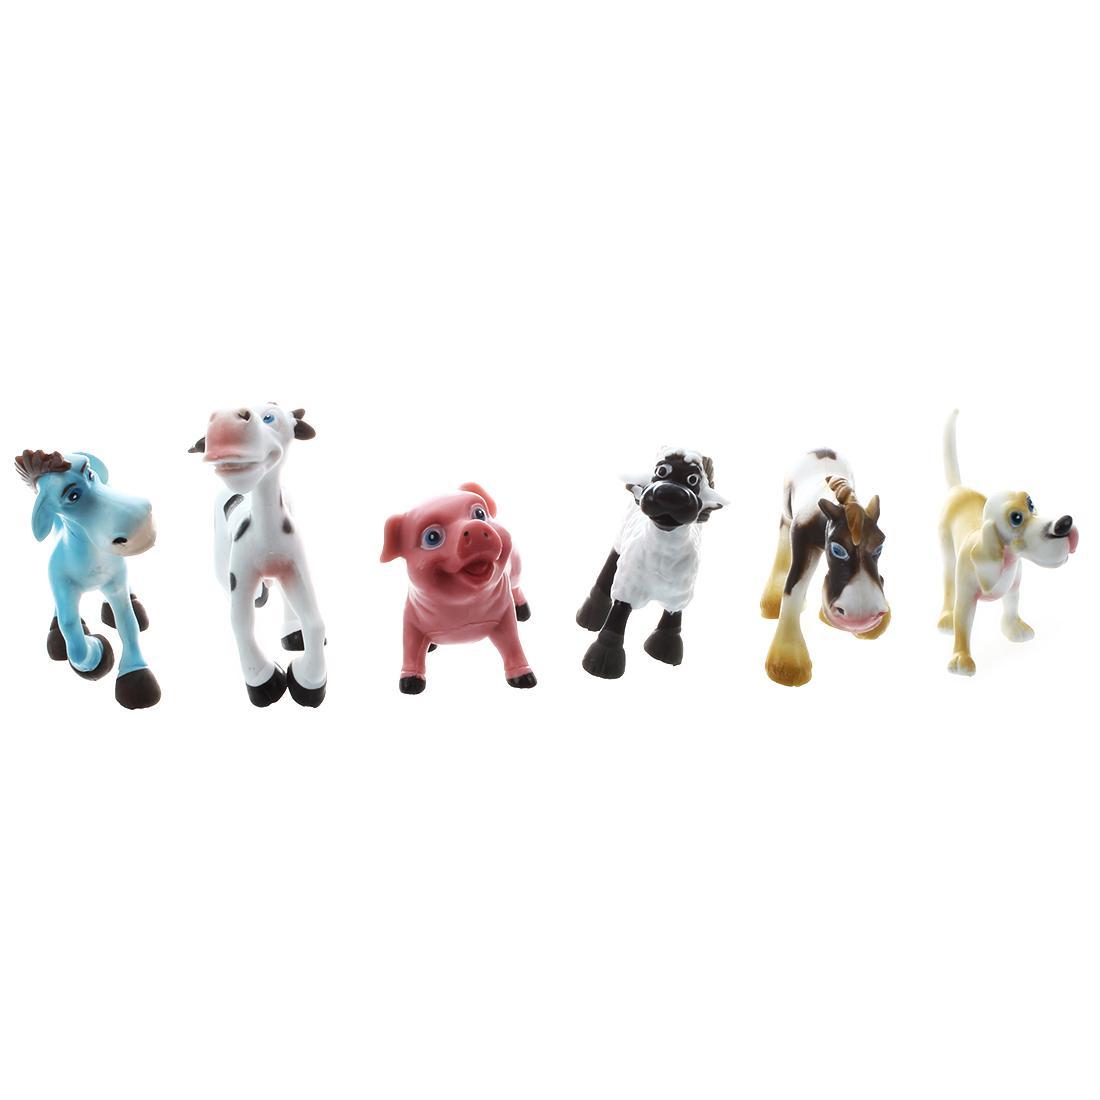 Penjualan Terlaris 6 Baru Plastik Keras Pertanian Kartun Tokoh Hewan Set Mainan Anak Anak-Intl